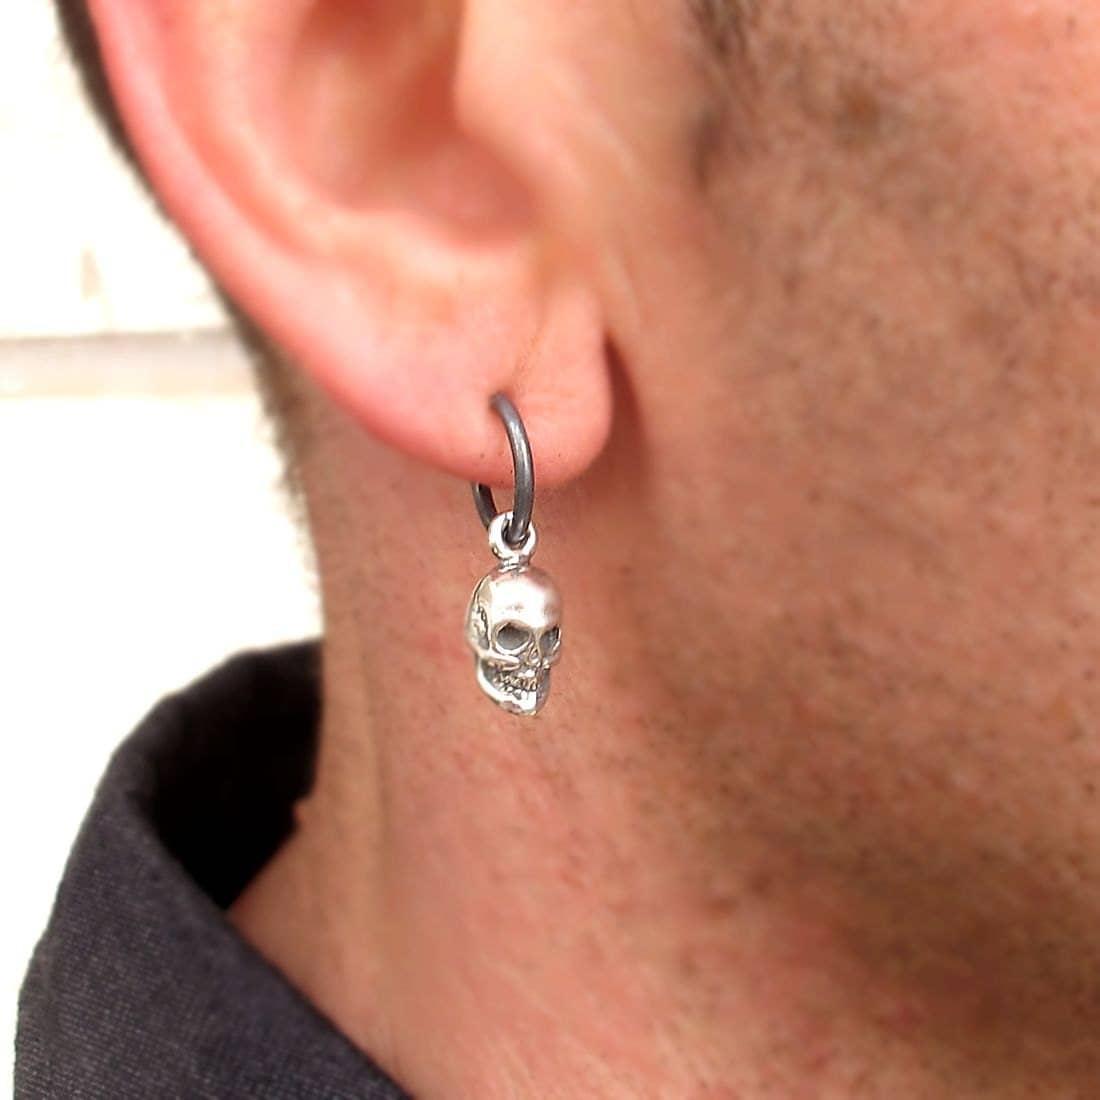 Mens earring skull earring for men mens jewelry punk for Men s jewelry earrings